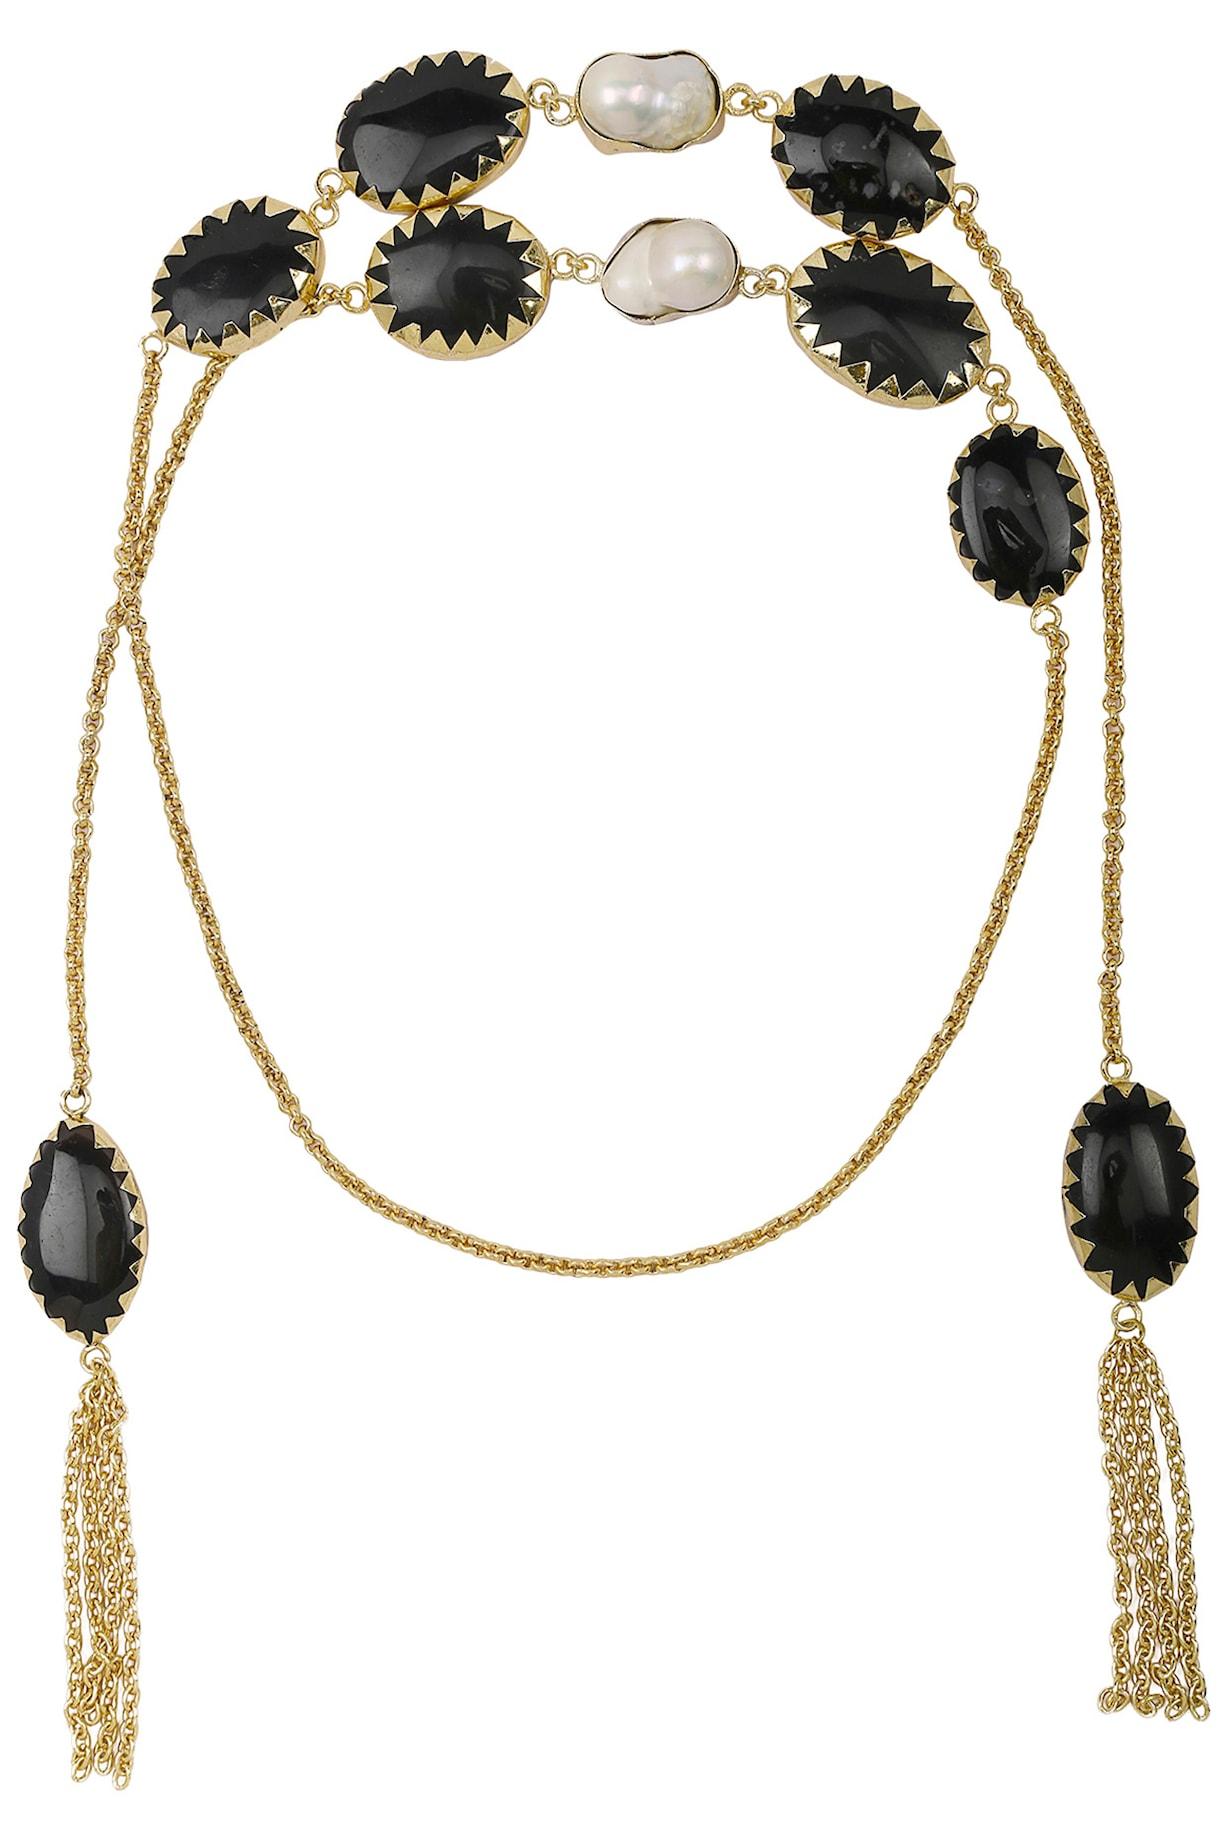 Maira Necklaces